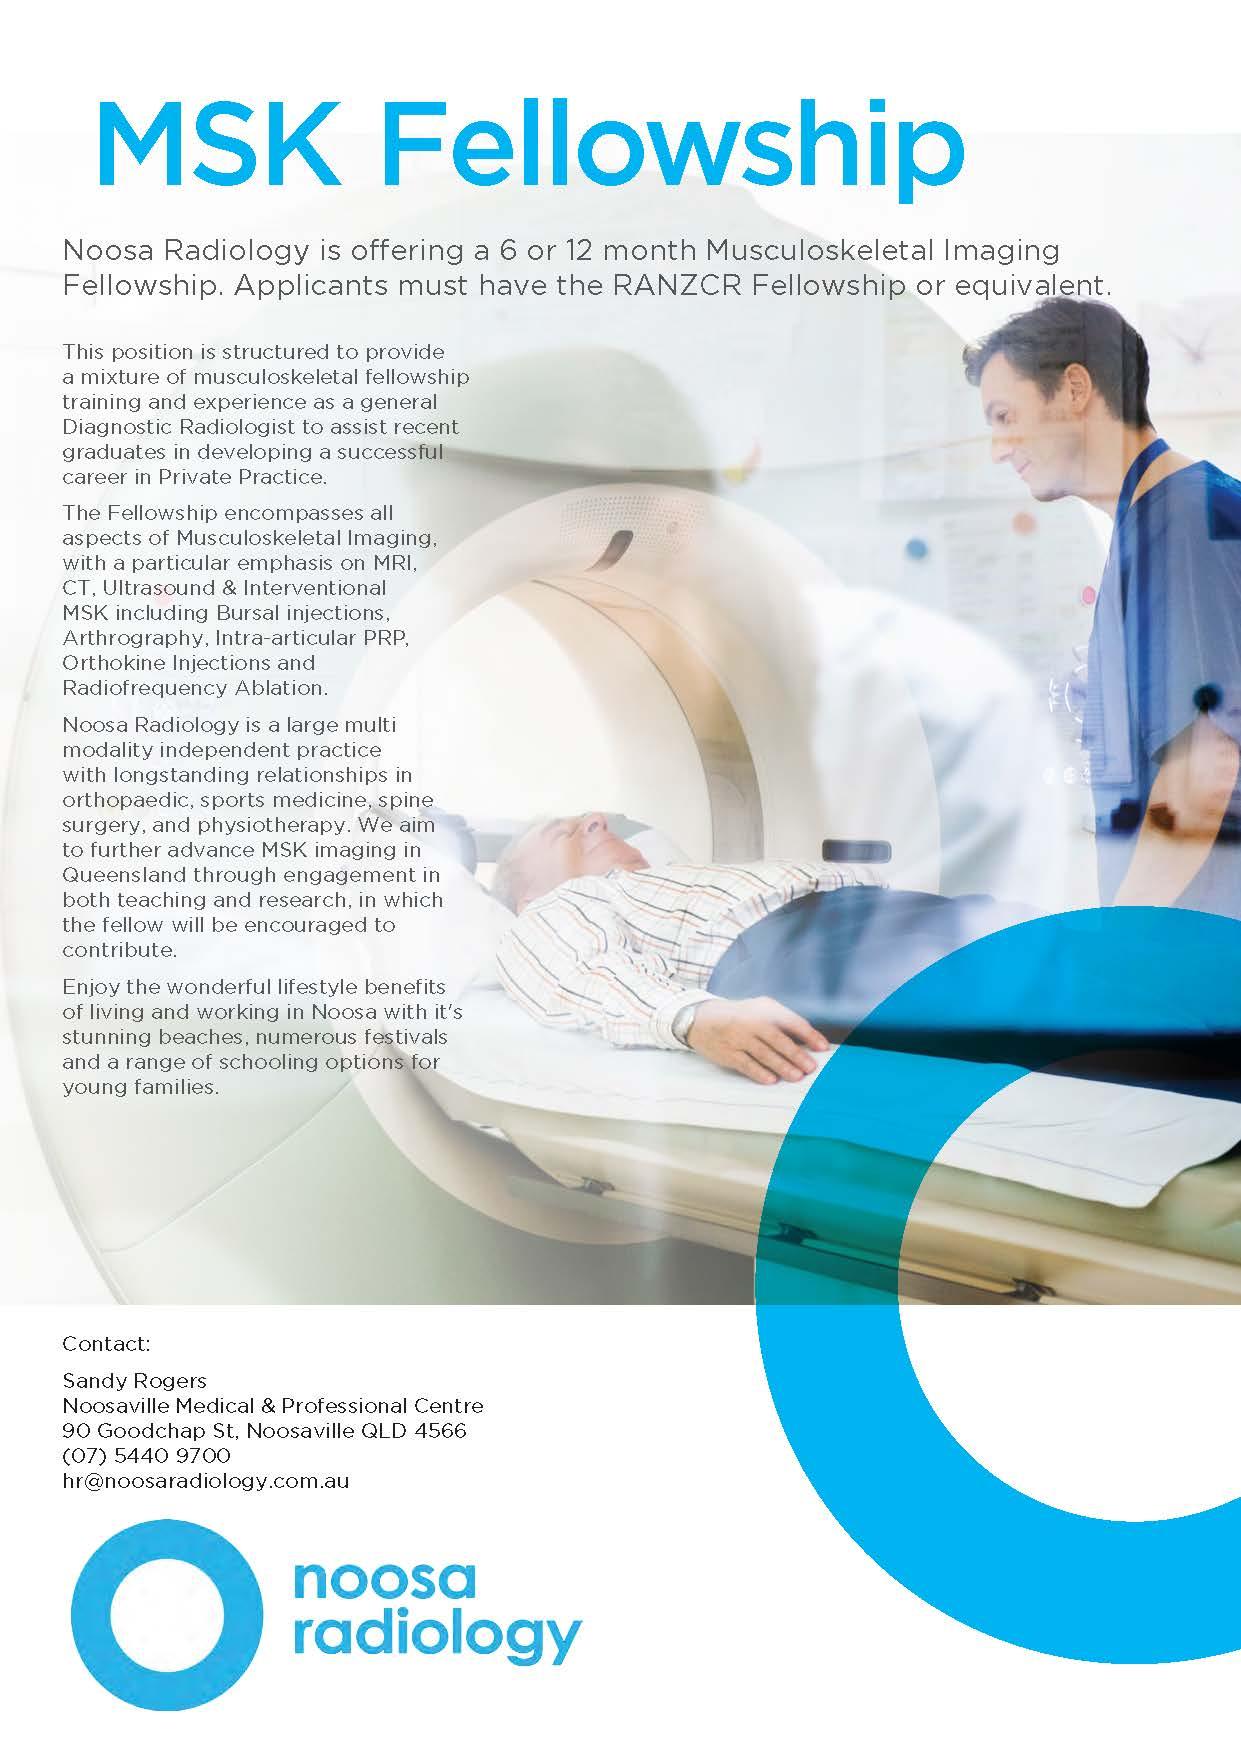 Musculoskeletal Fellowship - Noosa Radiology